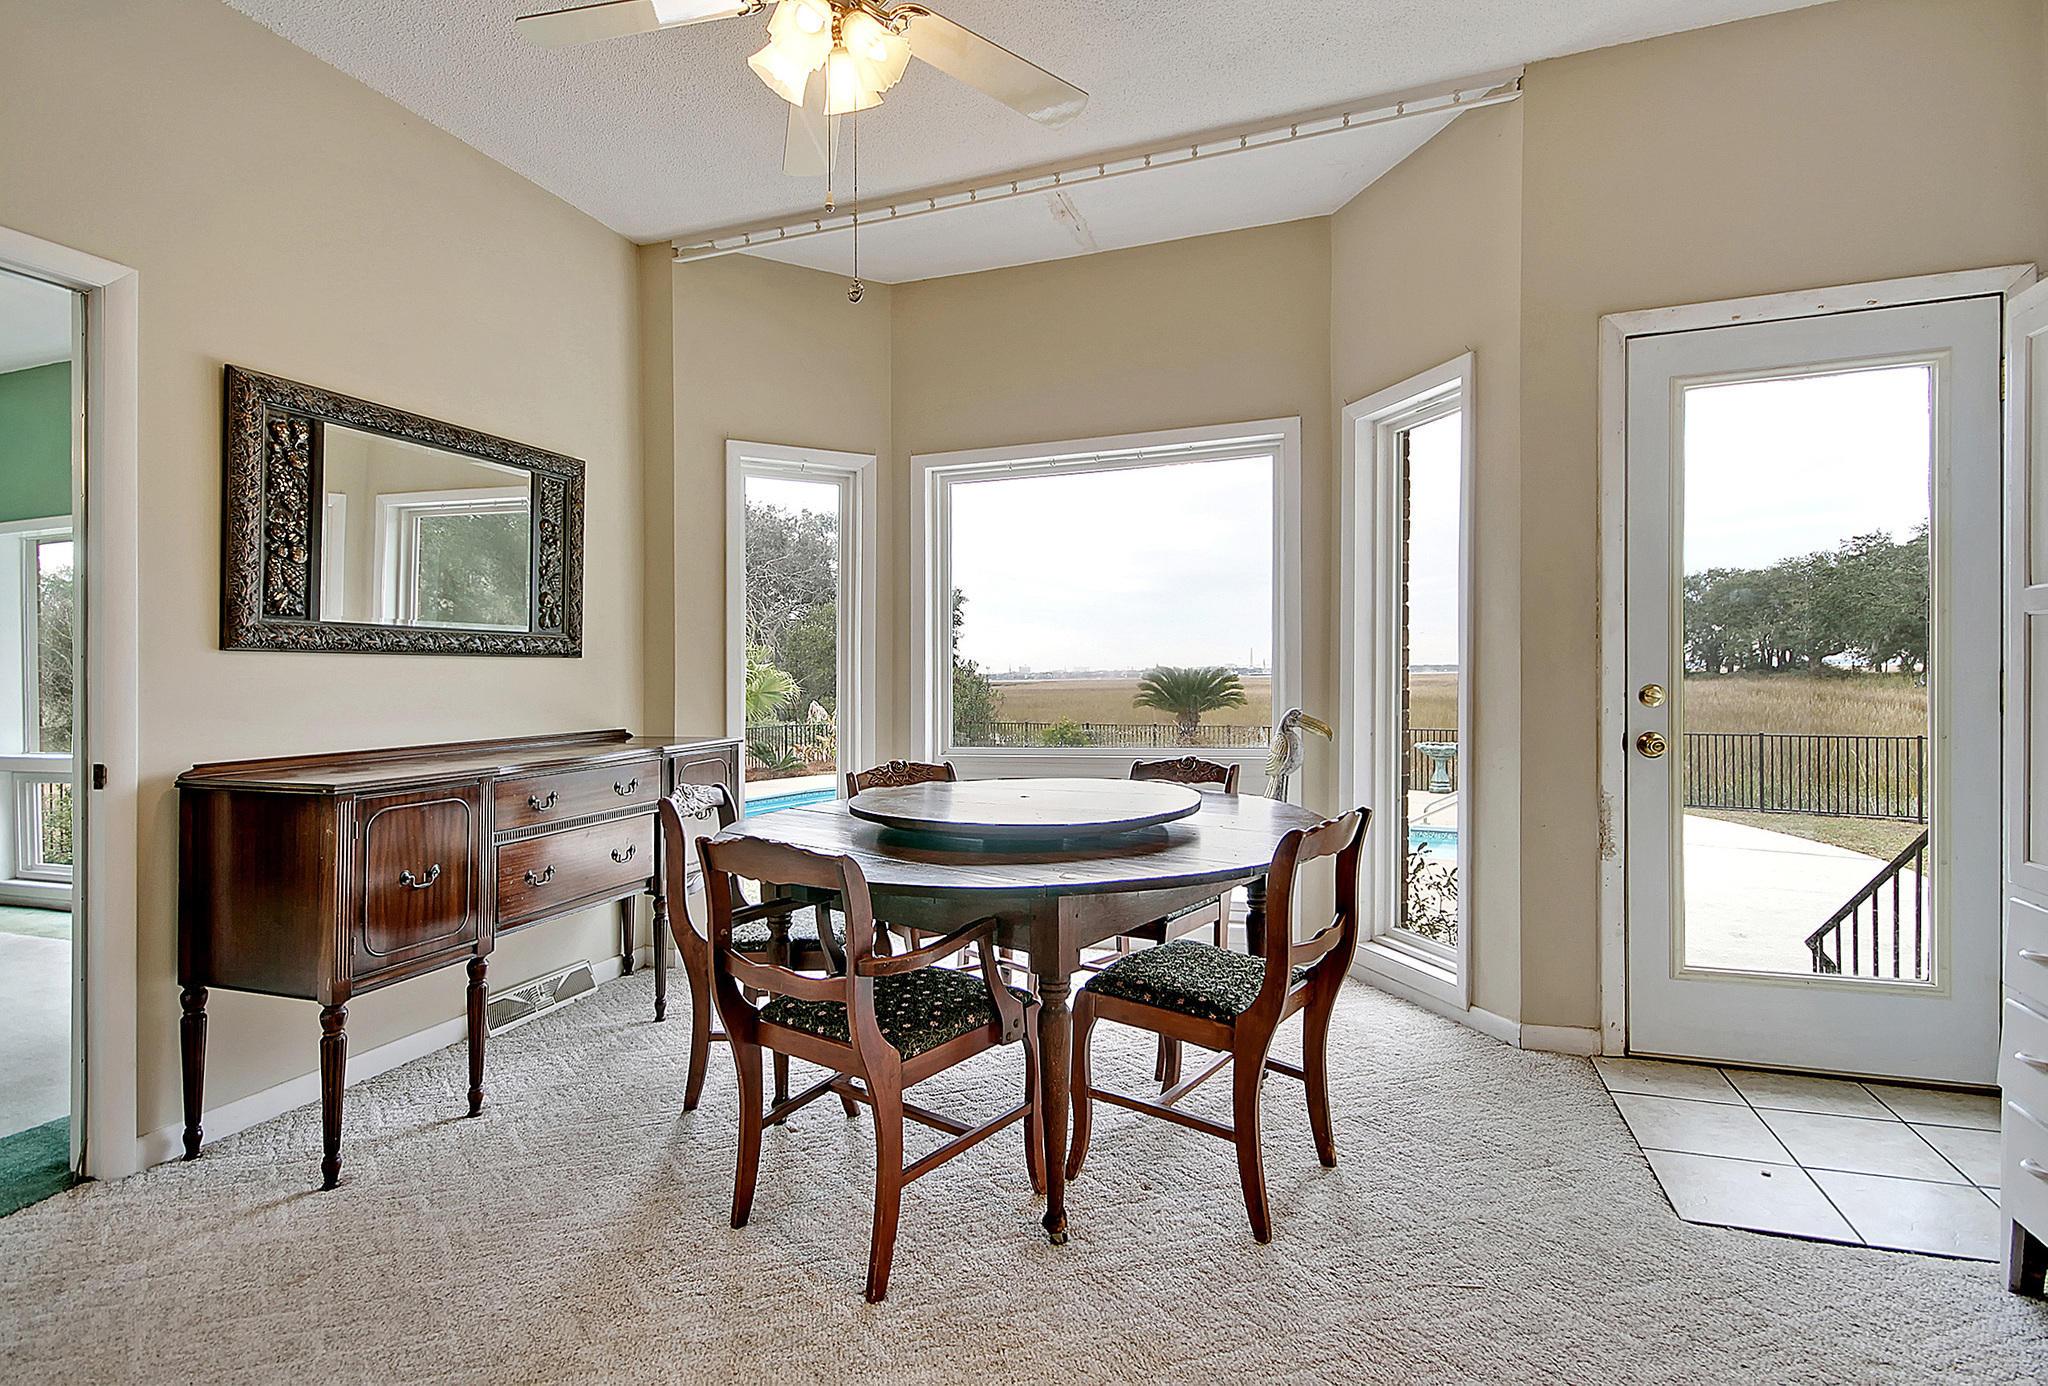 Lawton Bluff Homes For Sale - 608 Shore, Charleston, SC - 5